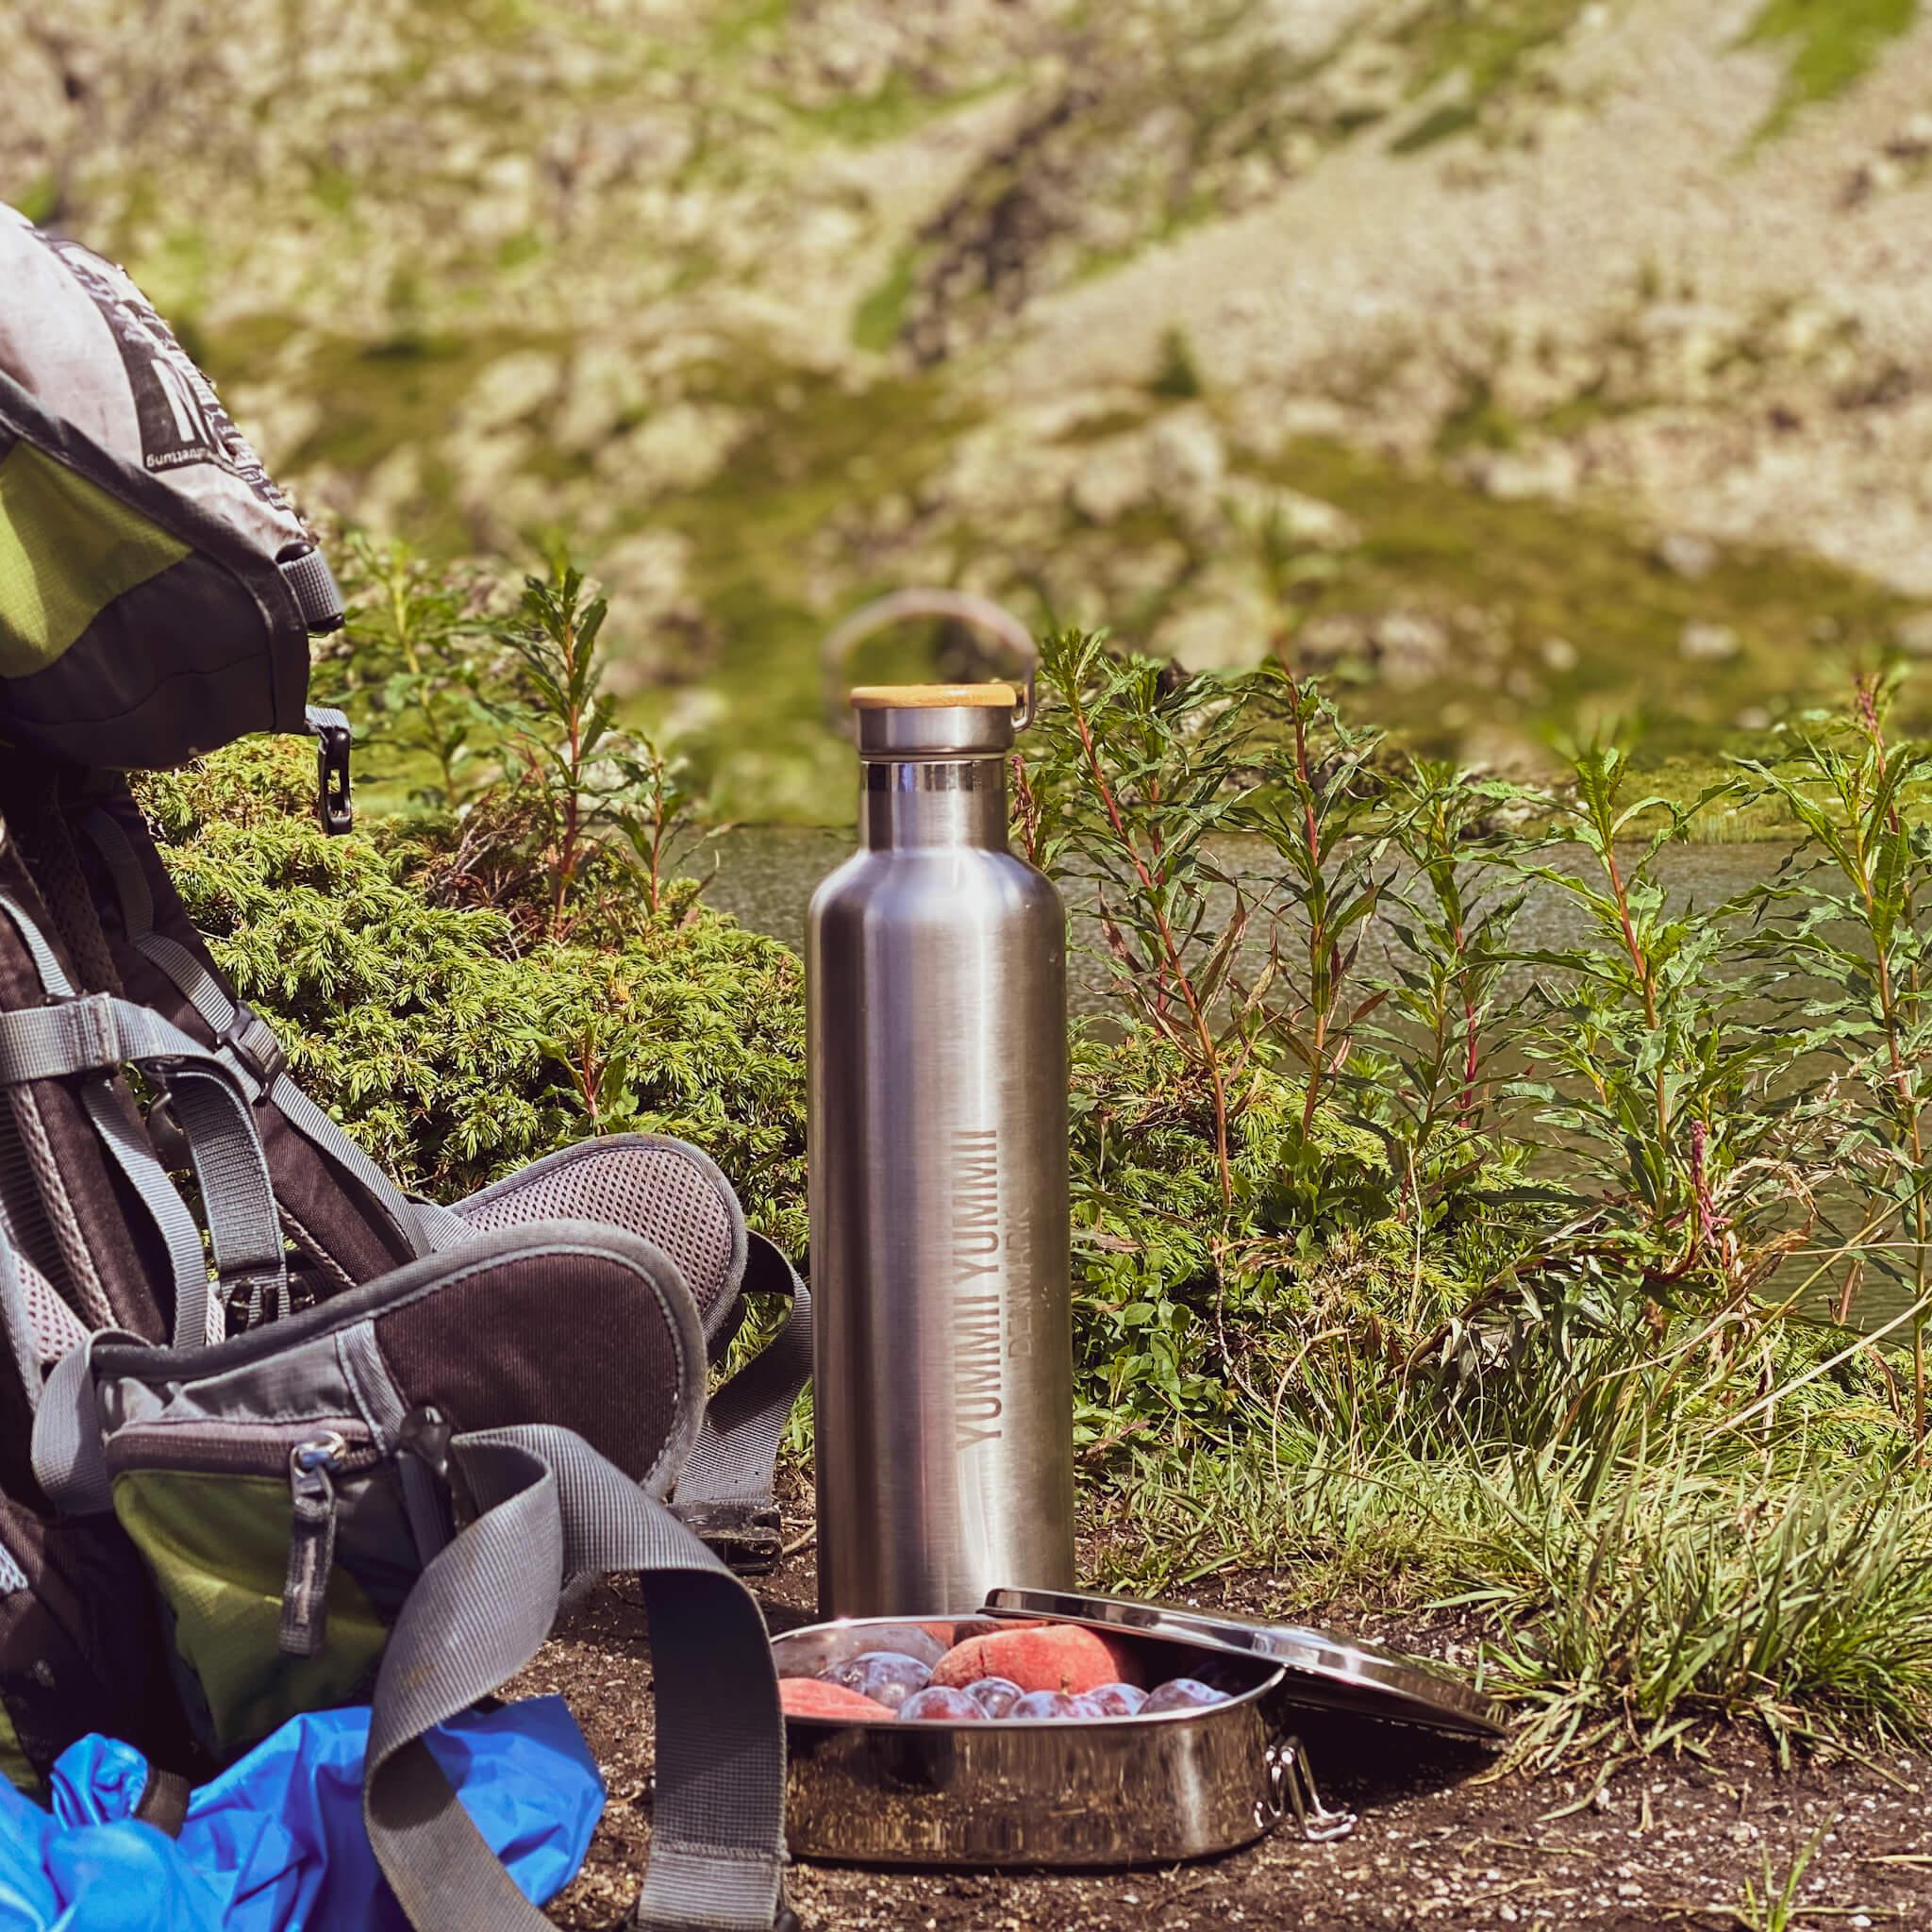 Bento Box Soul Bottle Wanderung Ausflug